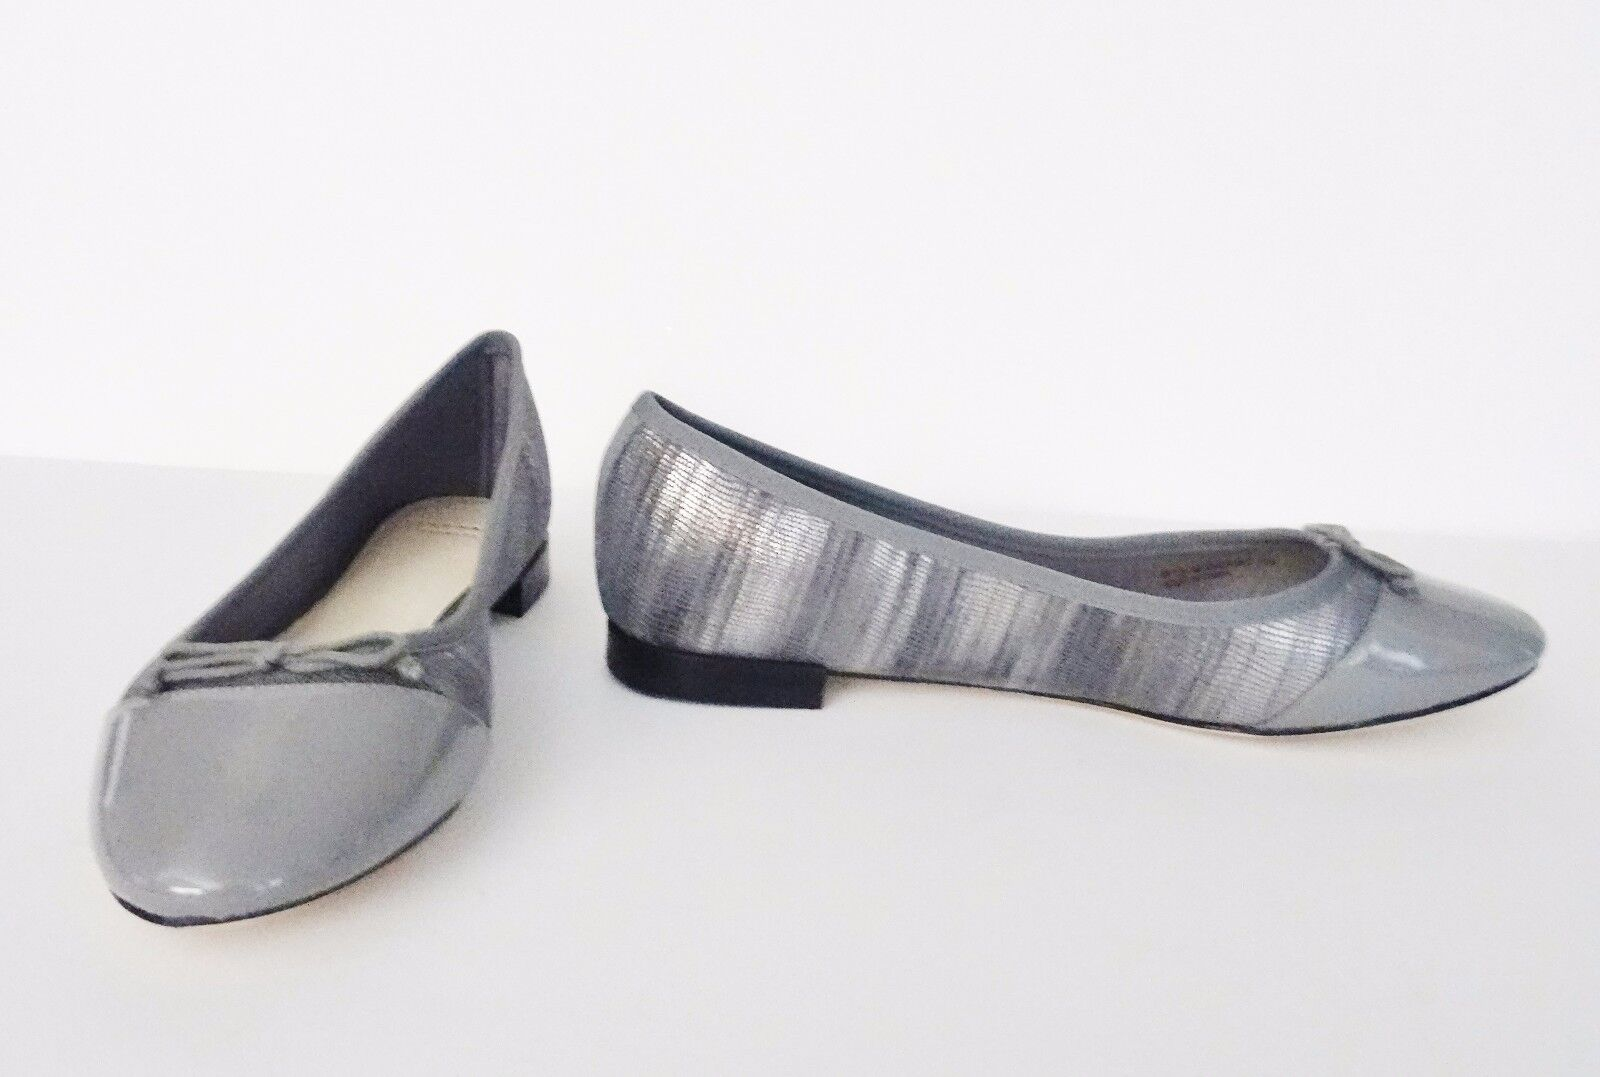 NIb Cole Haan Sarina Snake Embossed Leder Ballet Flat Ironstone Schuhes Sz 8.5 M Ironstone Flat 398930